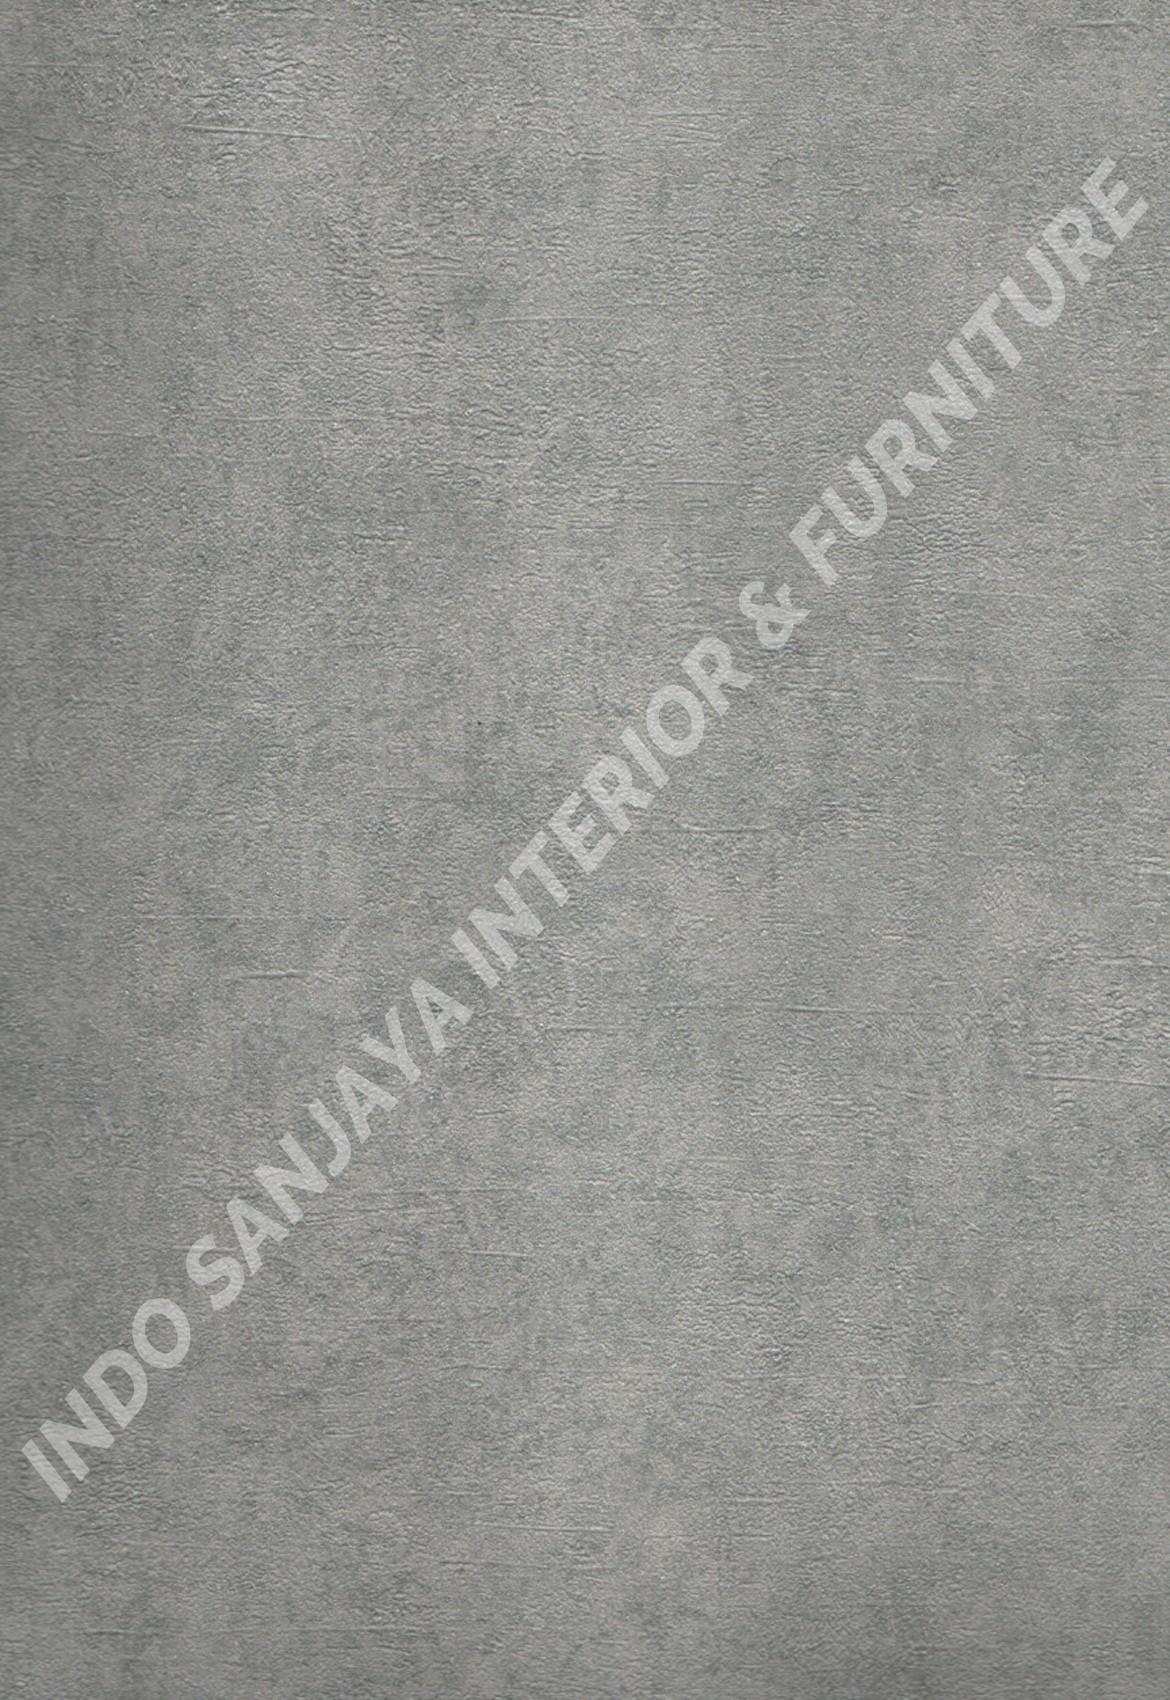 wallpaper   Wallpaper Minimalis Polos GK019-1:GK019-1 corak  warna